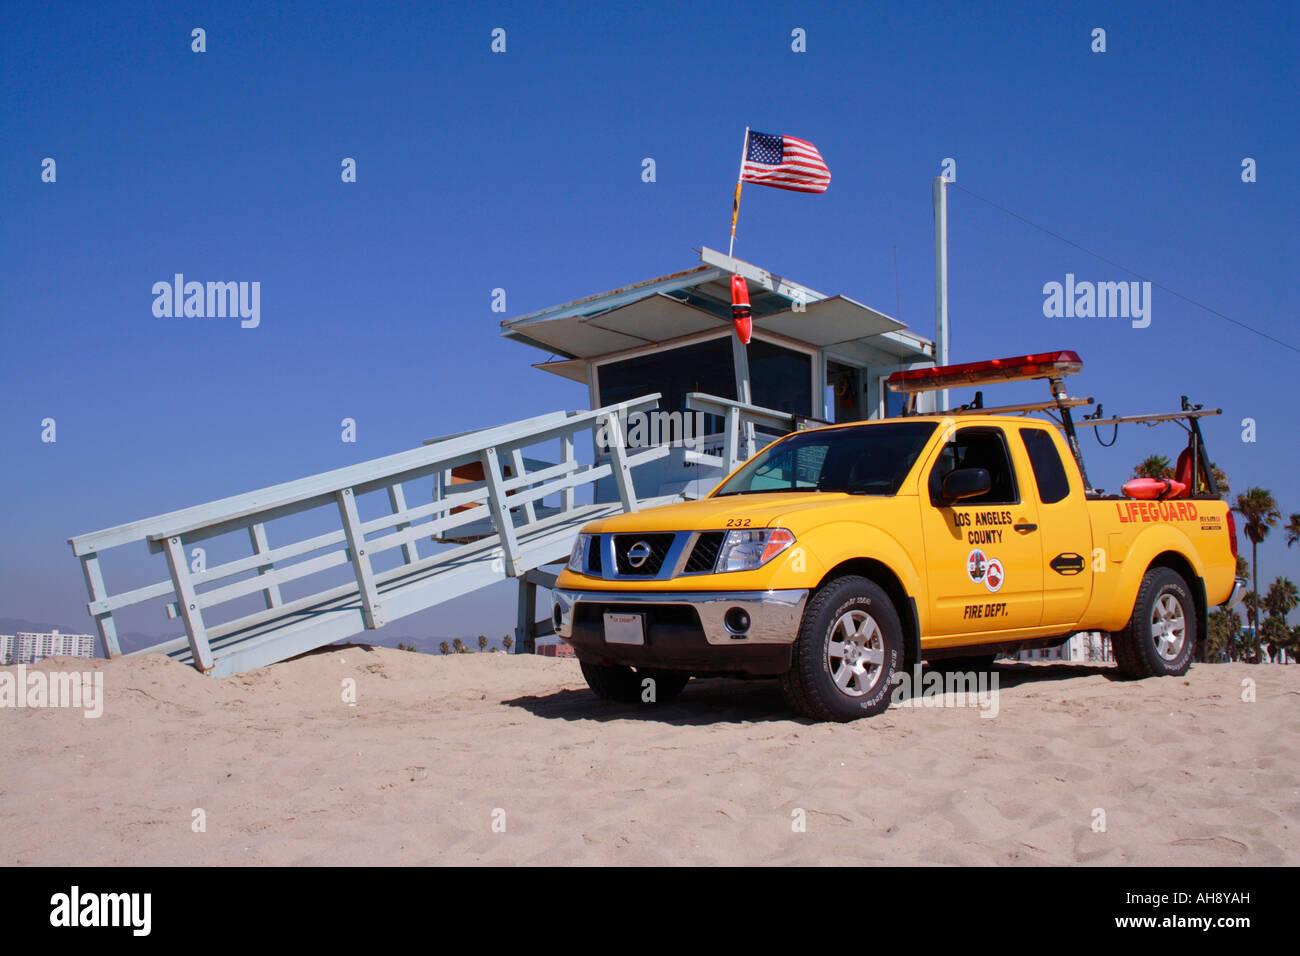 Lifeguard hut Venice Beach Stock Photo